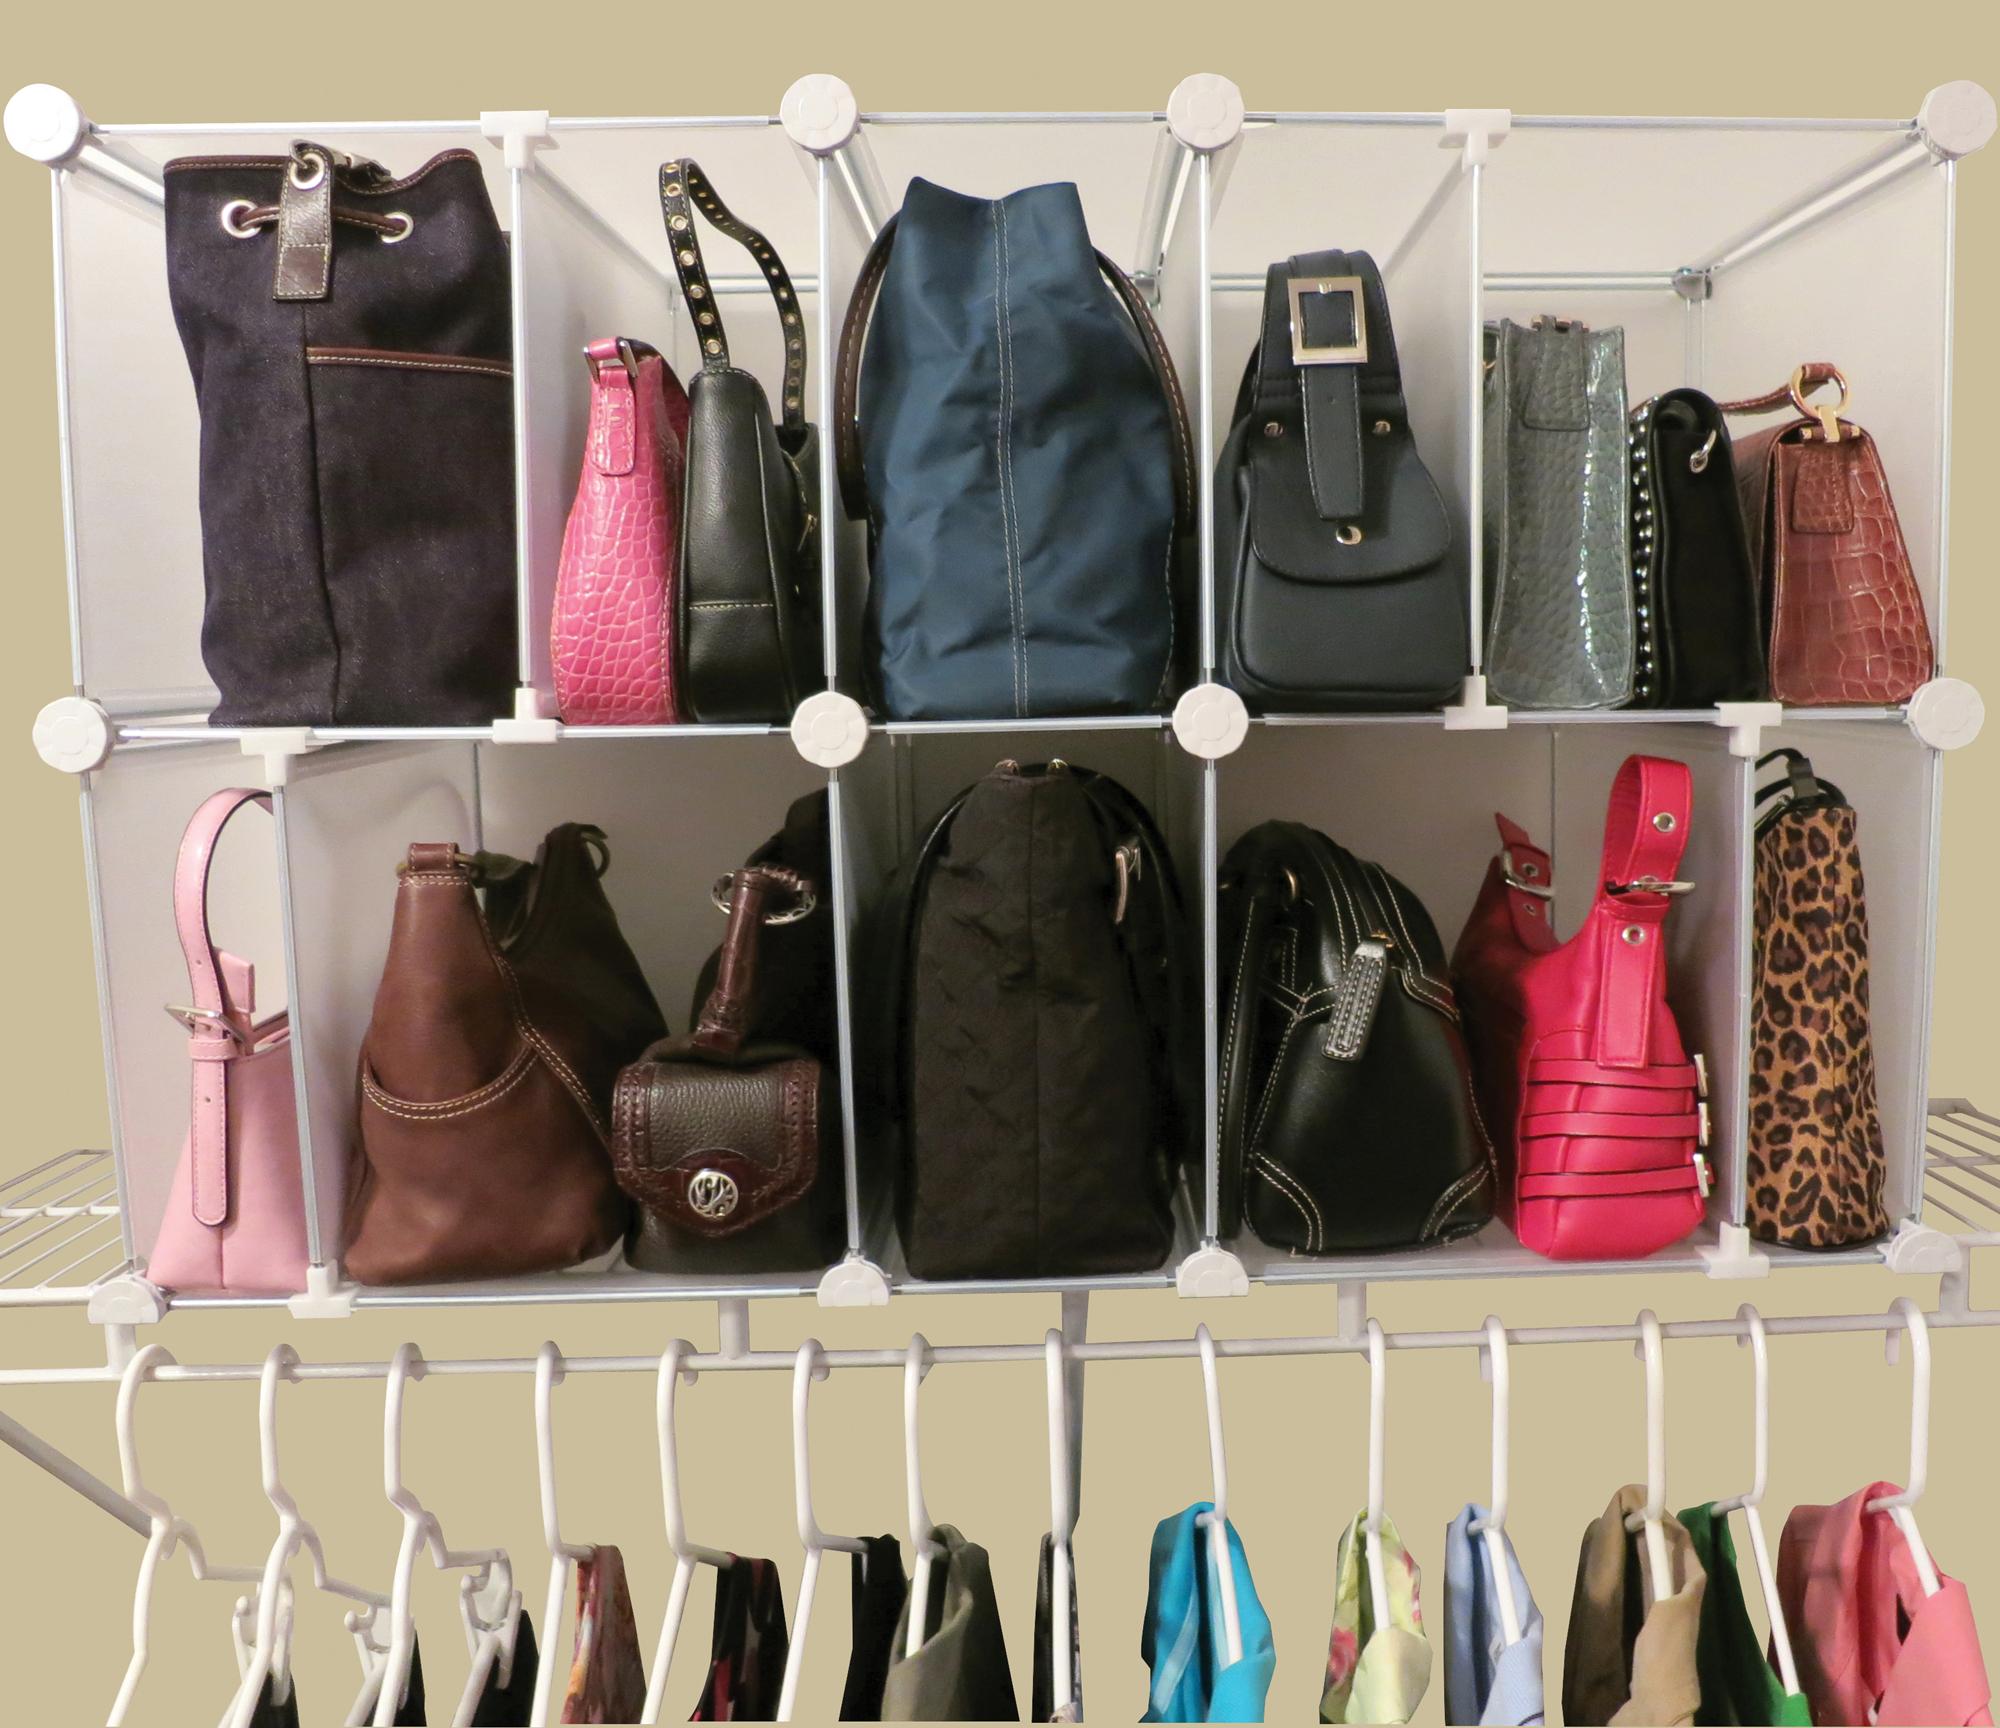 20+ Diseños de Closets Perfectos que te van a Encantar para tu Casa